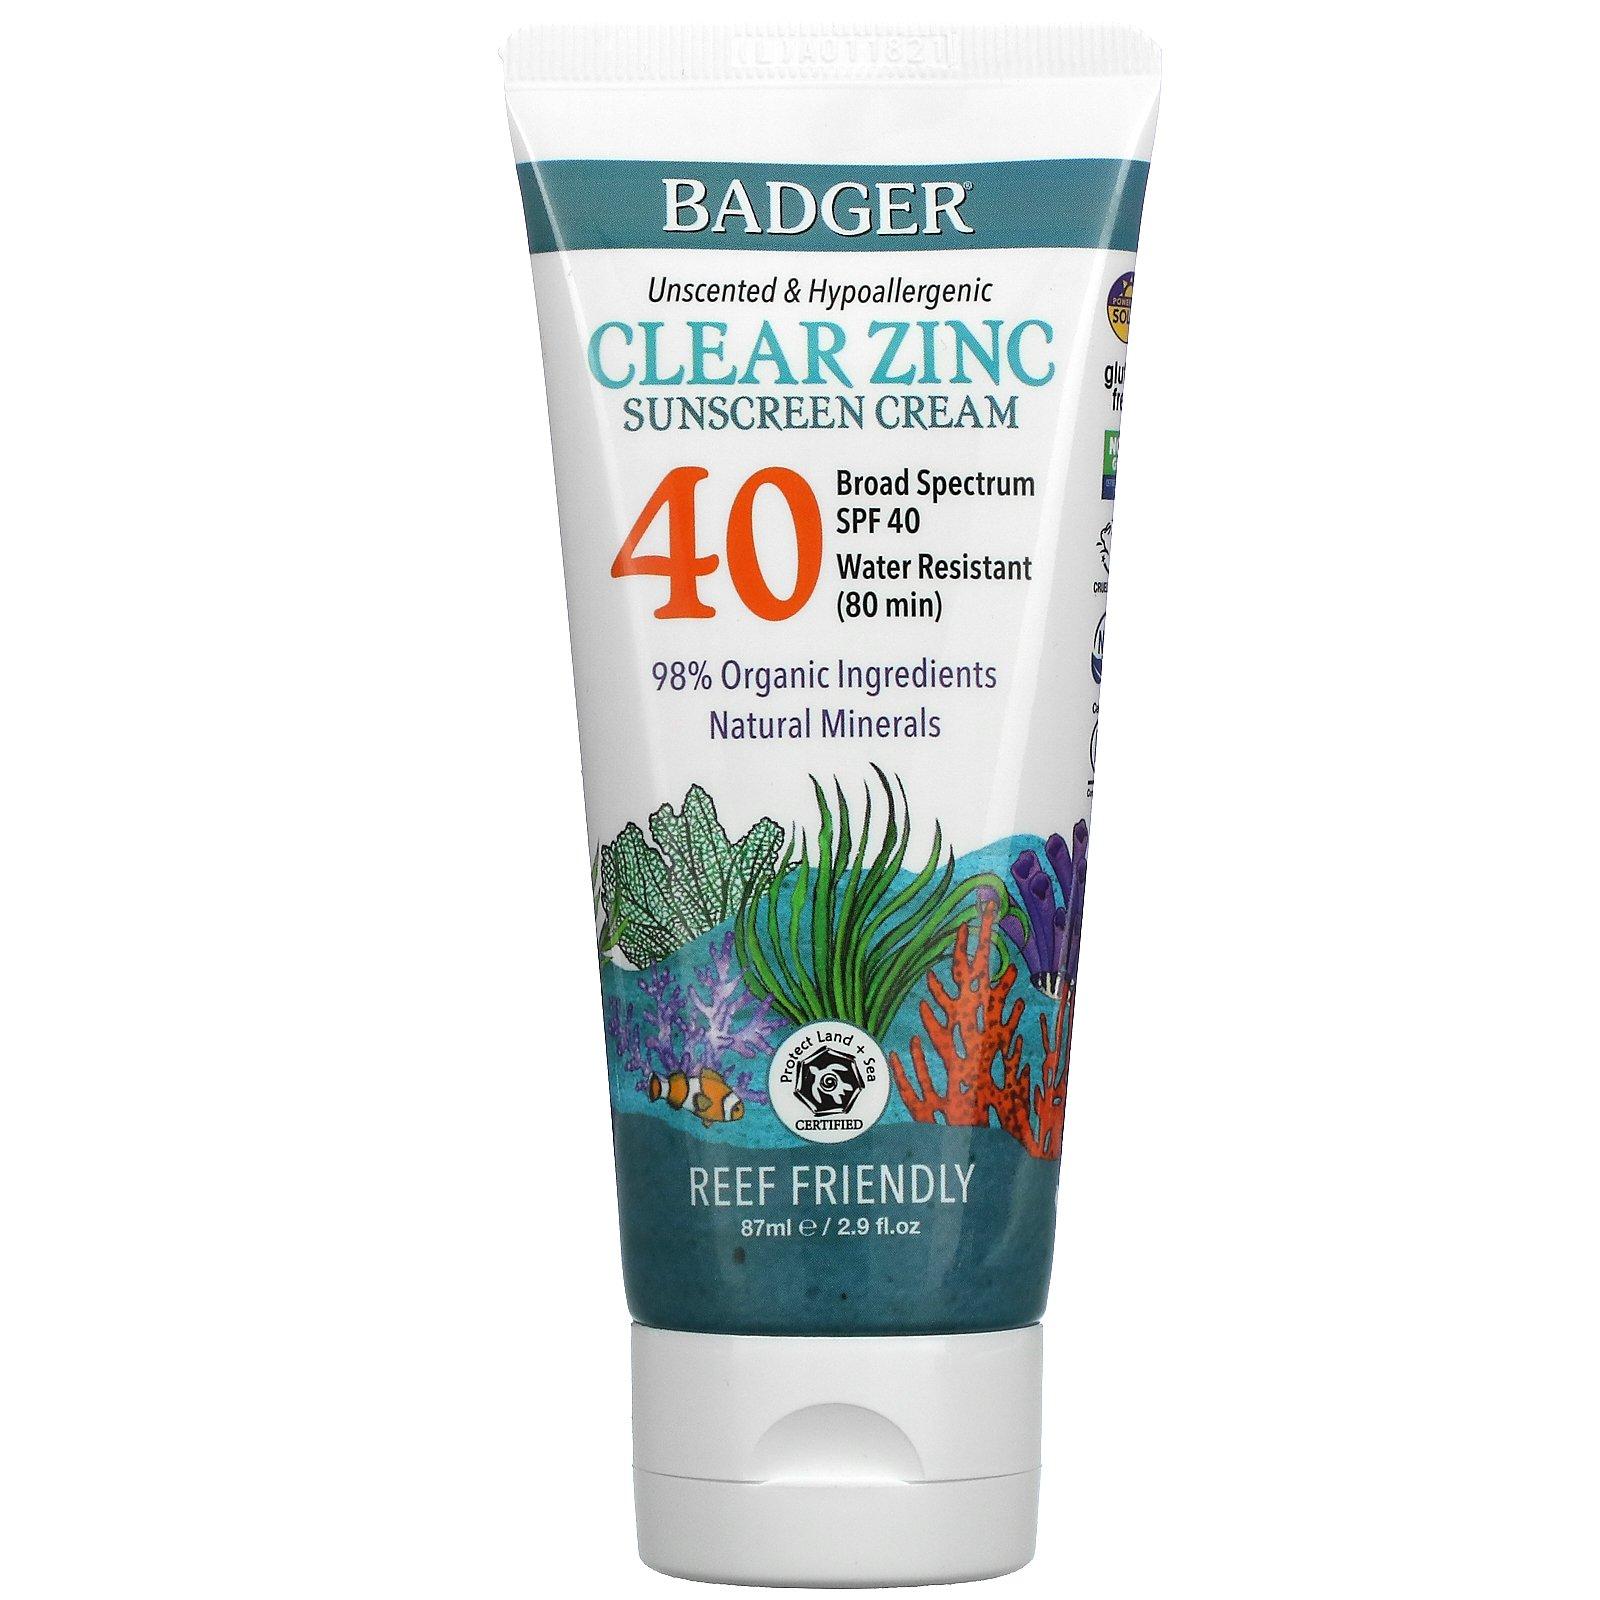 Badger Company, Clear Zinc Sunscreen Cream, SPF40, Unscented, 2.9 fl oz (87 ml)